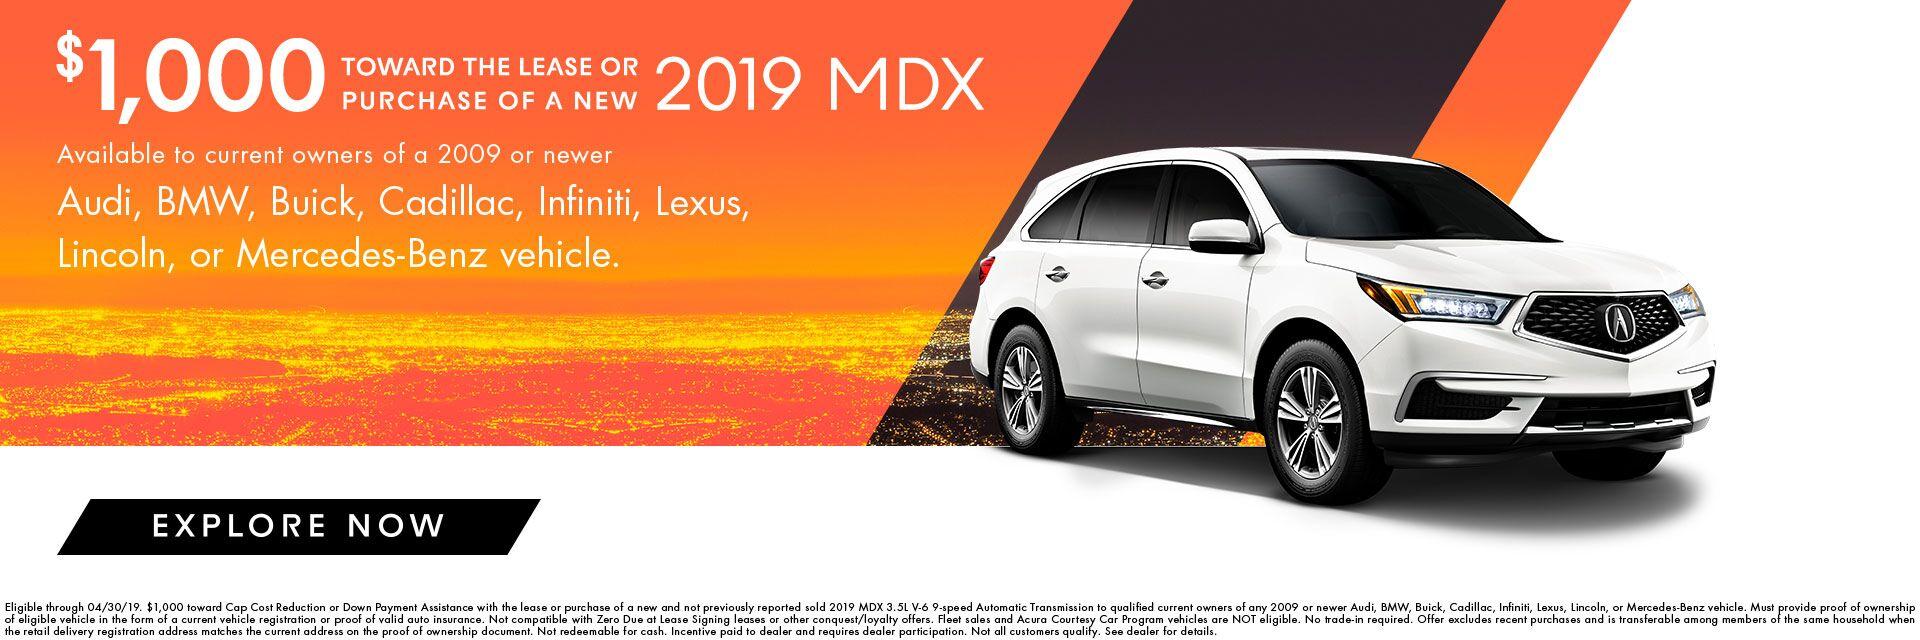 2019 Mdx Incentives At Acura Of Modesto